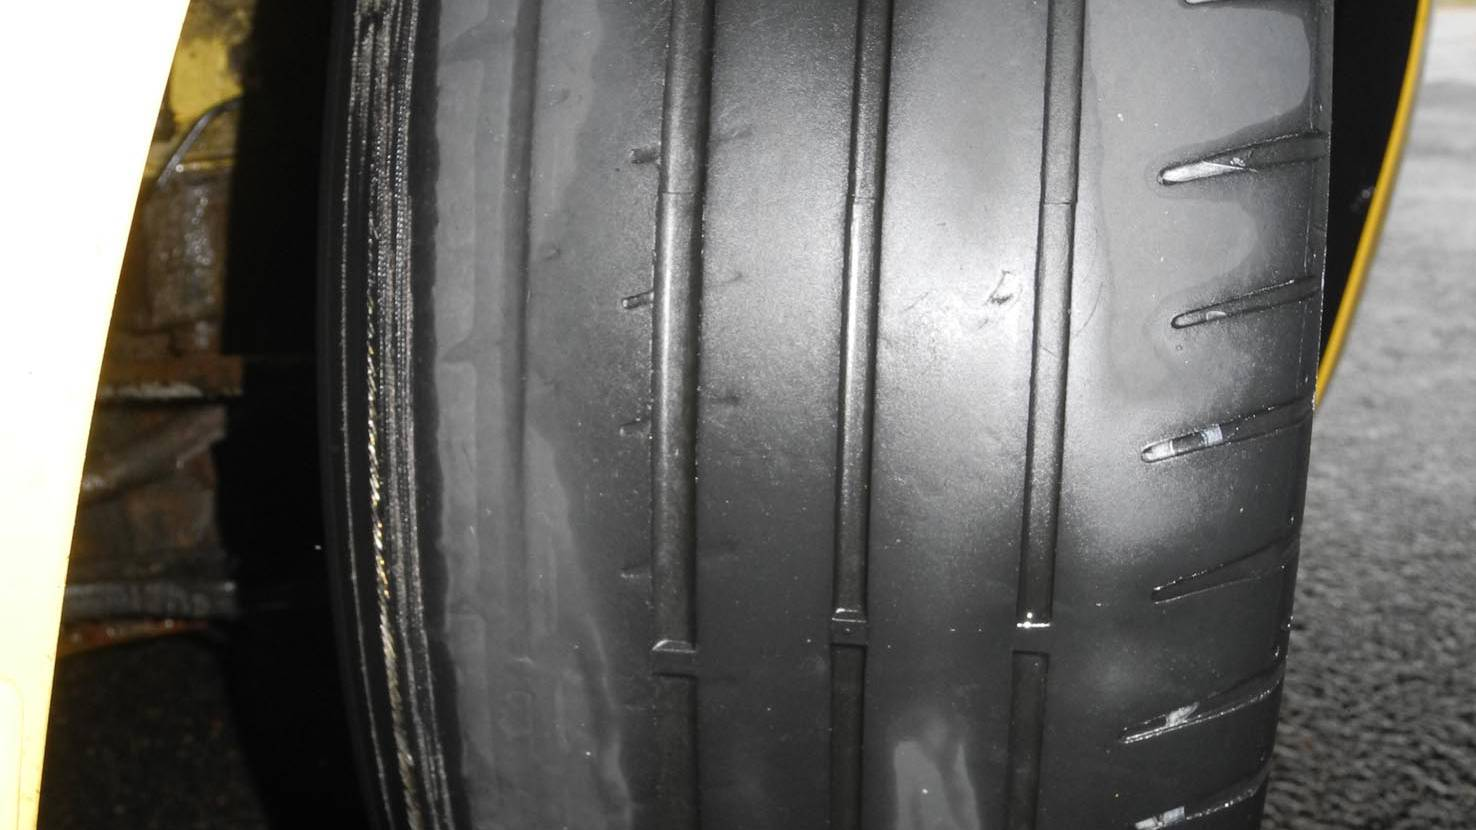 Abgefahrene Reifen